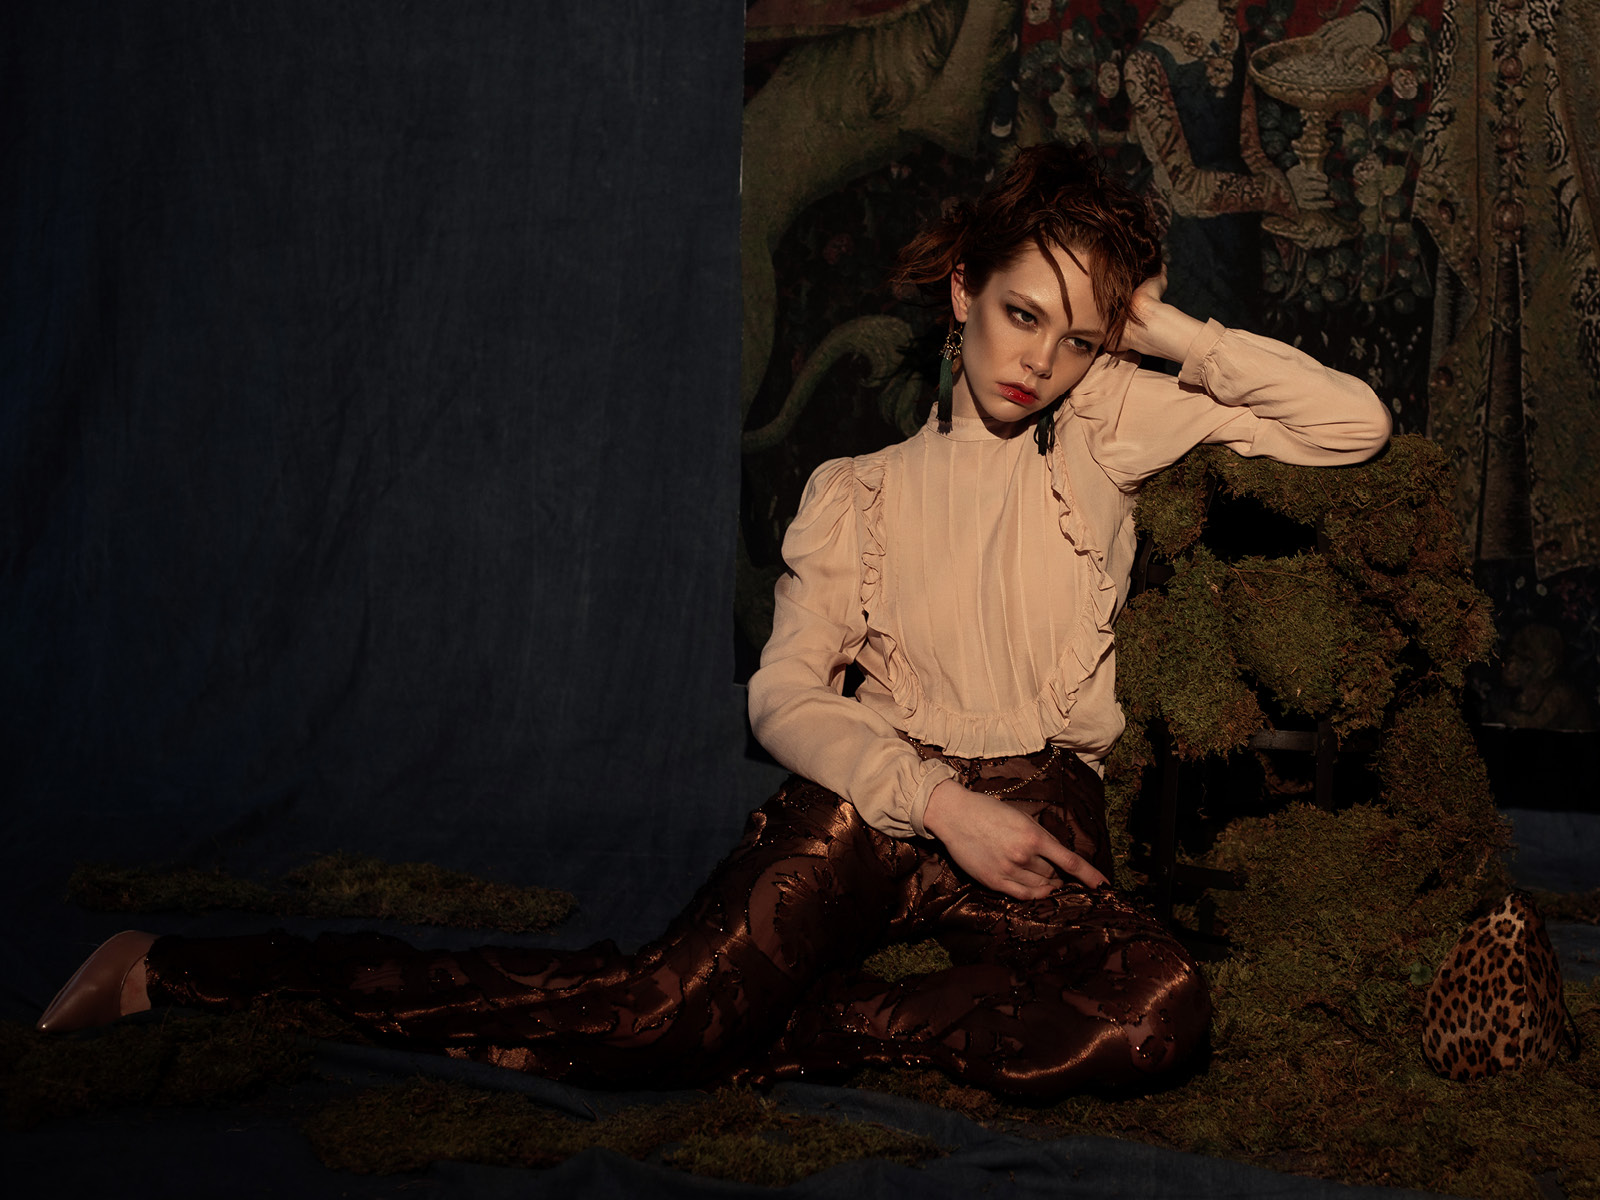 Spirit-&-Flesh-Magazine_Unicorn_3